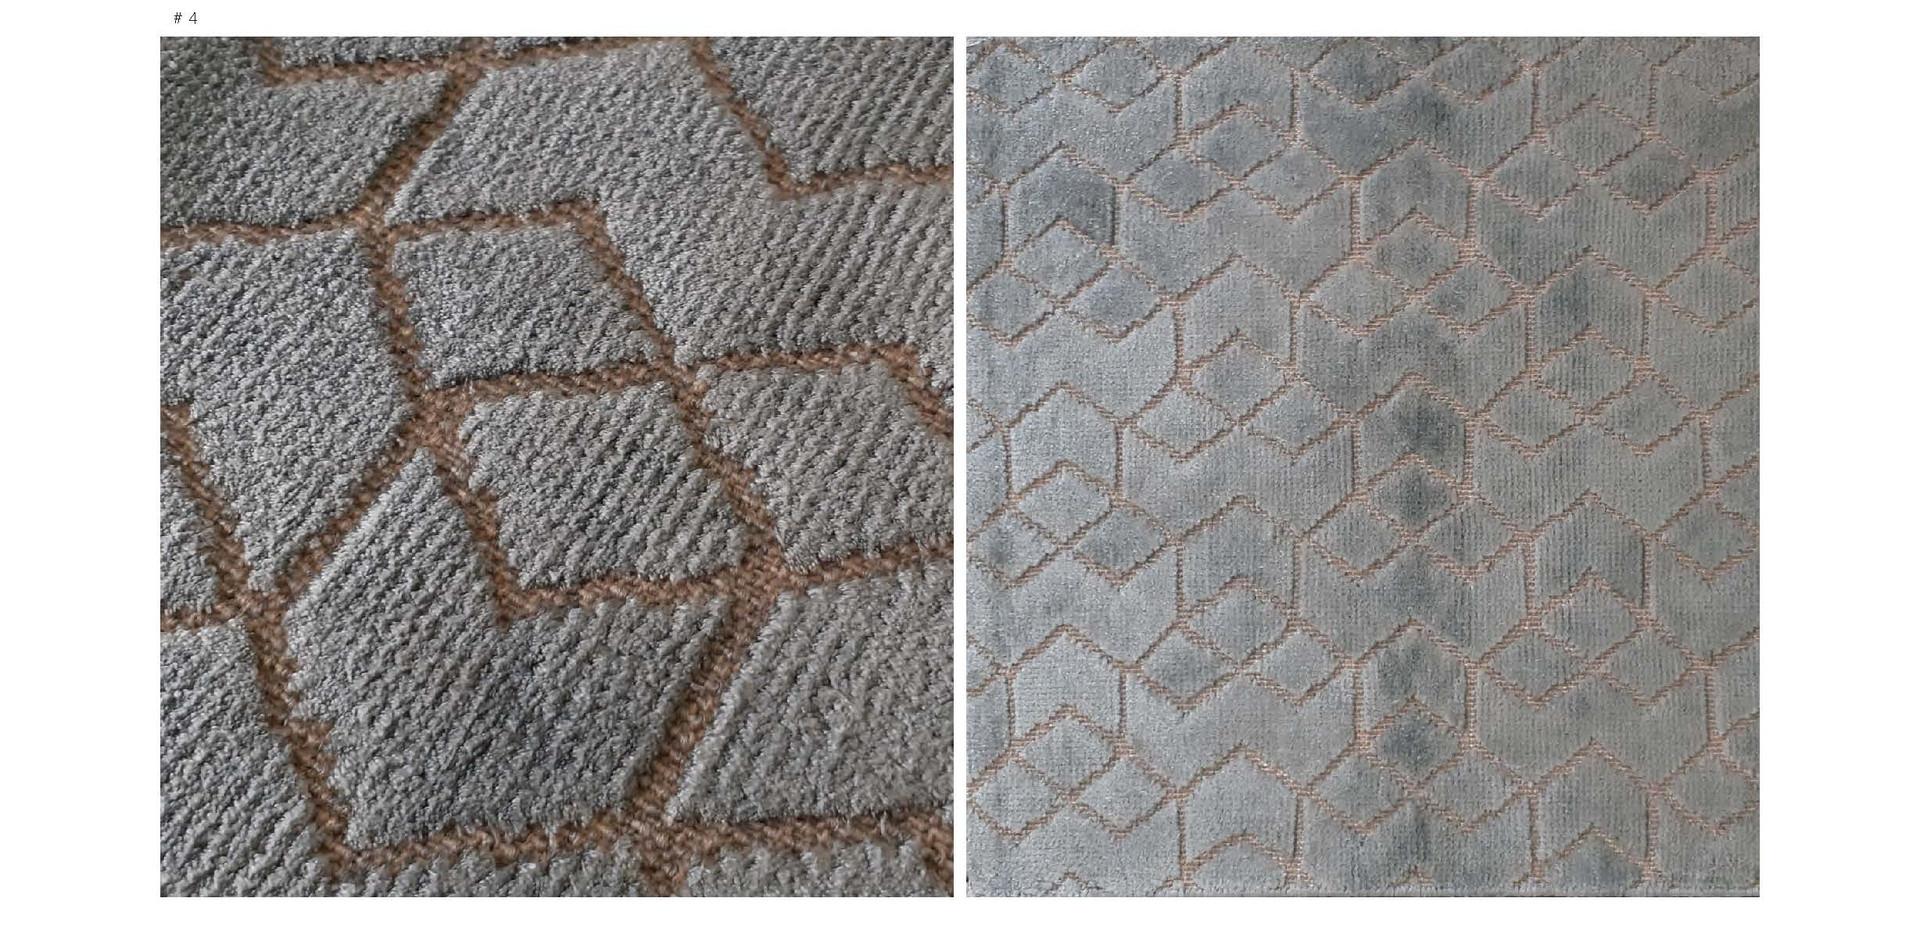 17. Geometric Designs by Insigne 07.jpg